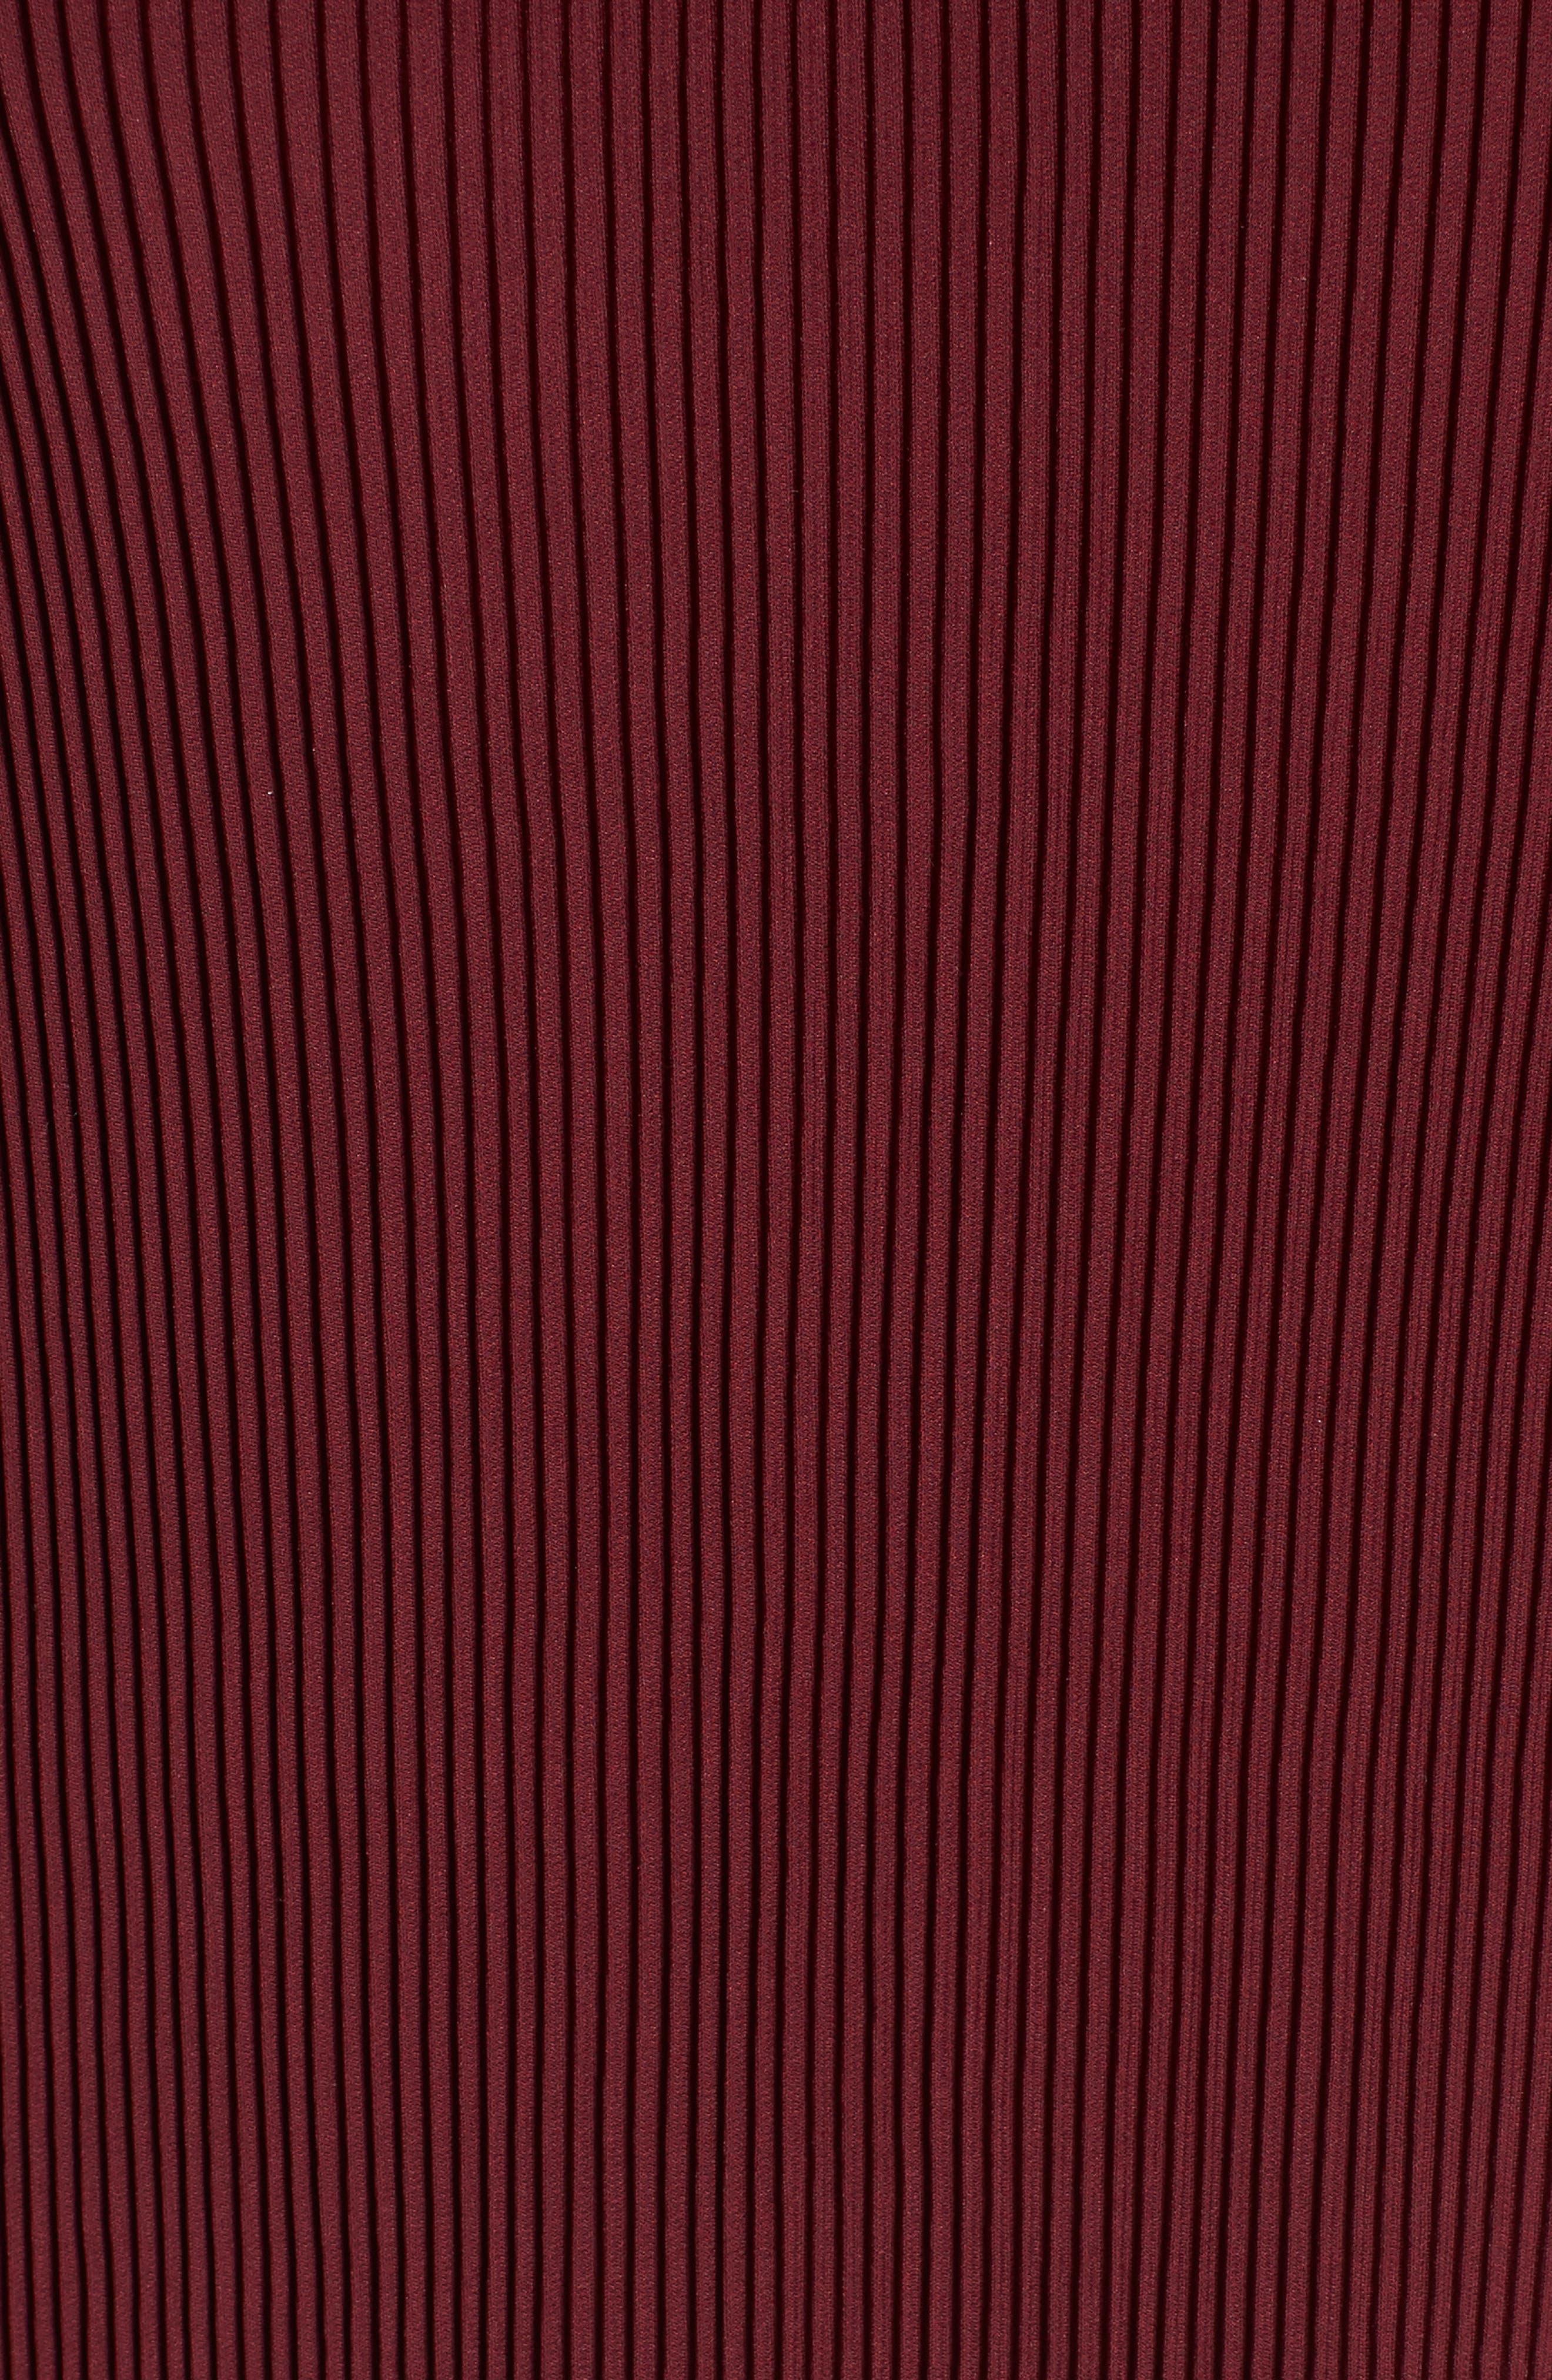 Brinley Ruffle Cold Shoulder Top,                             Alternate thumbnail 5, color,                             932